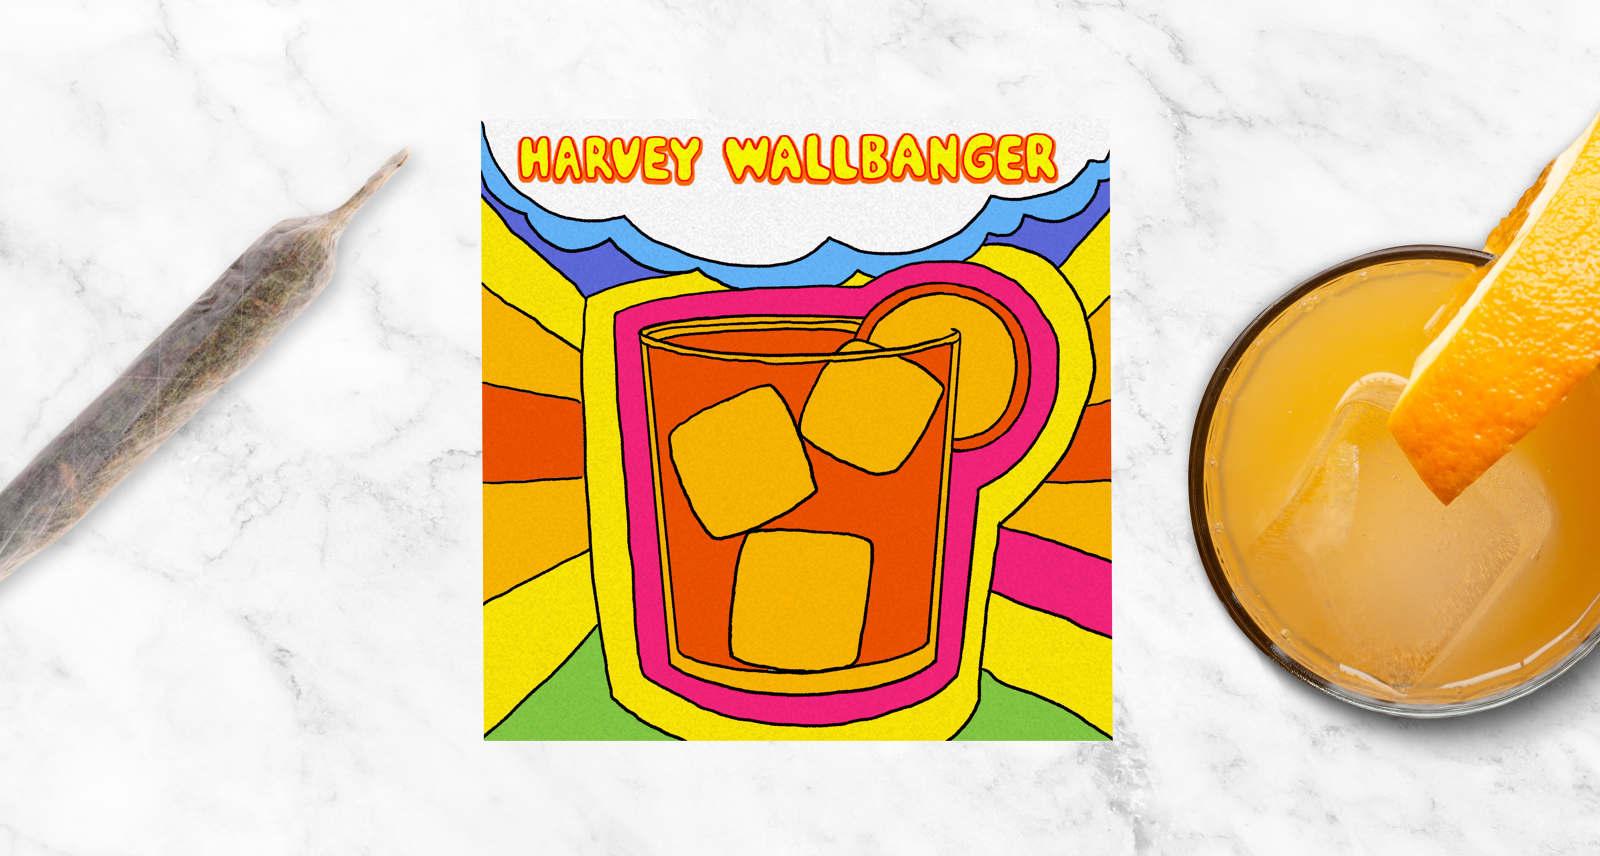 38  HARVEY WALLBANGER: 1969 - Letters and Liquor